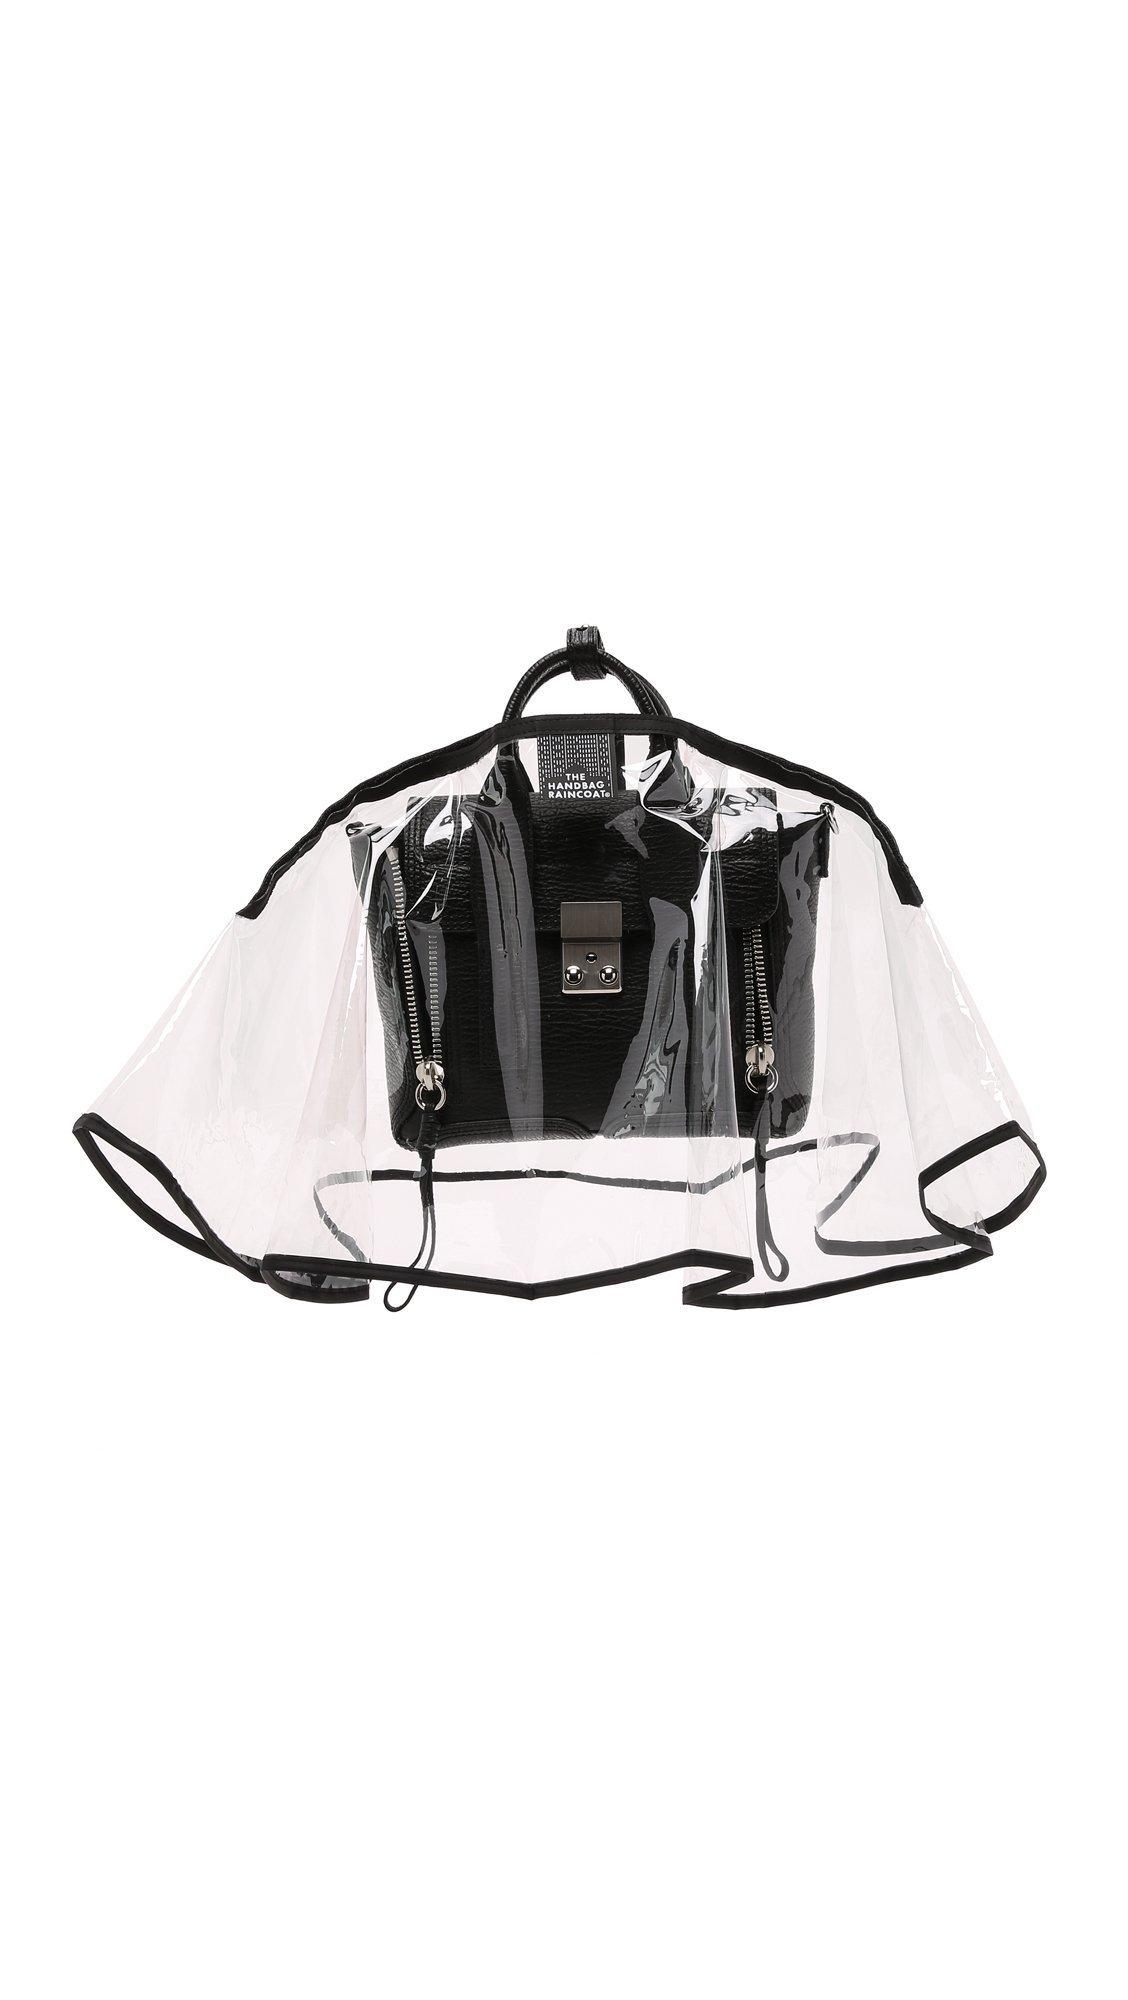 The Handbag Raincoat Women's Mini City Slicker Handbag Raincoat, Clear/Black, One Size